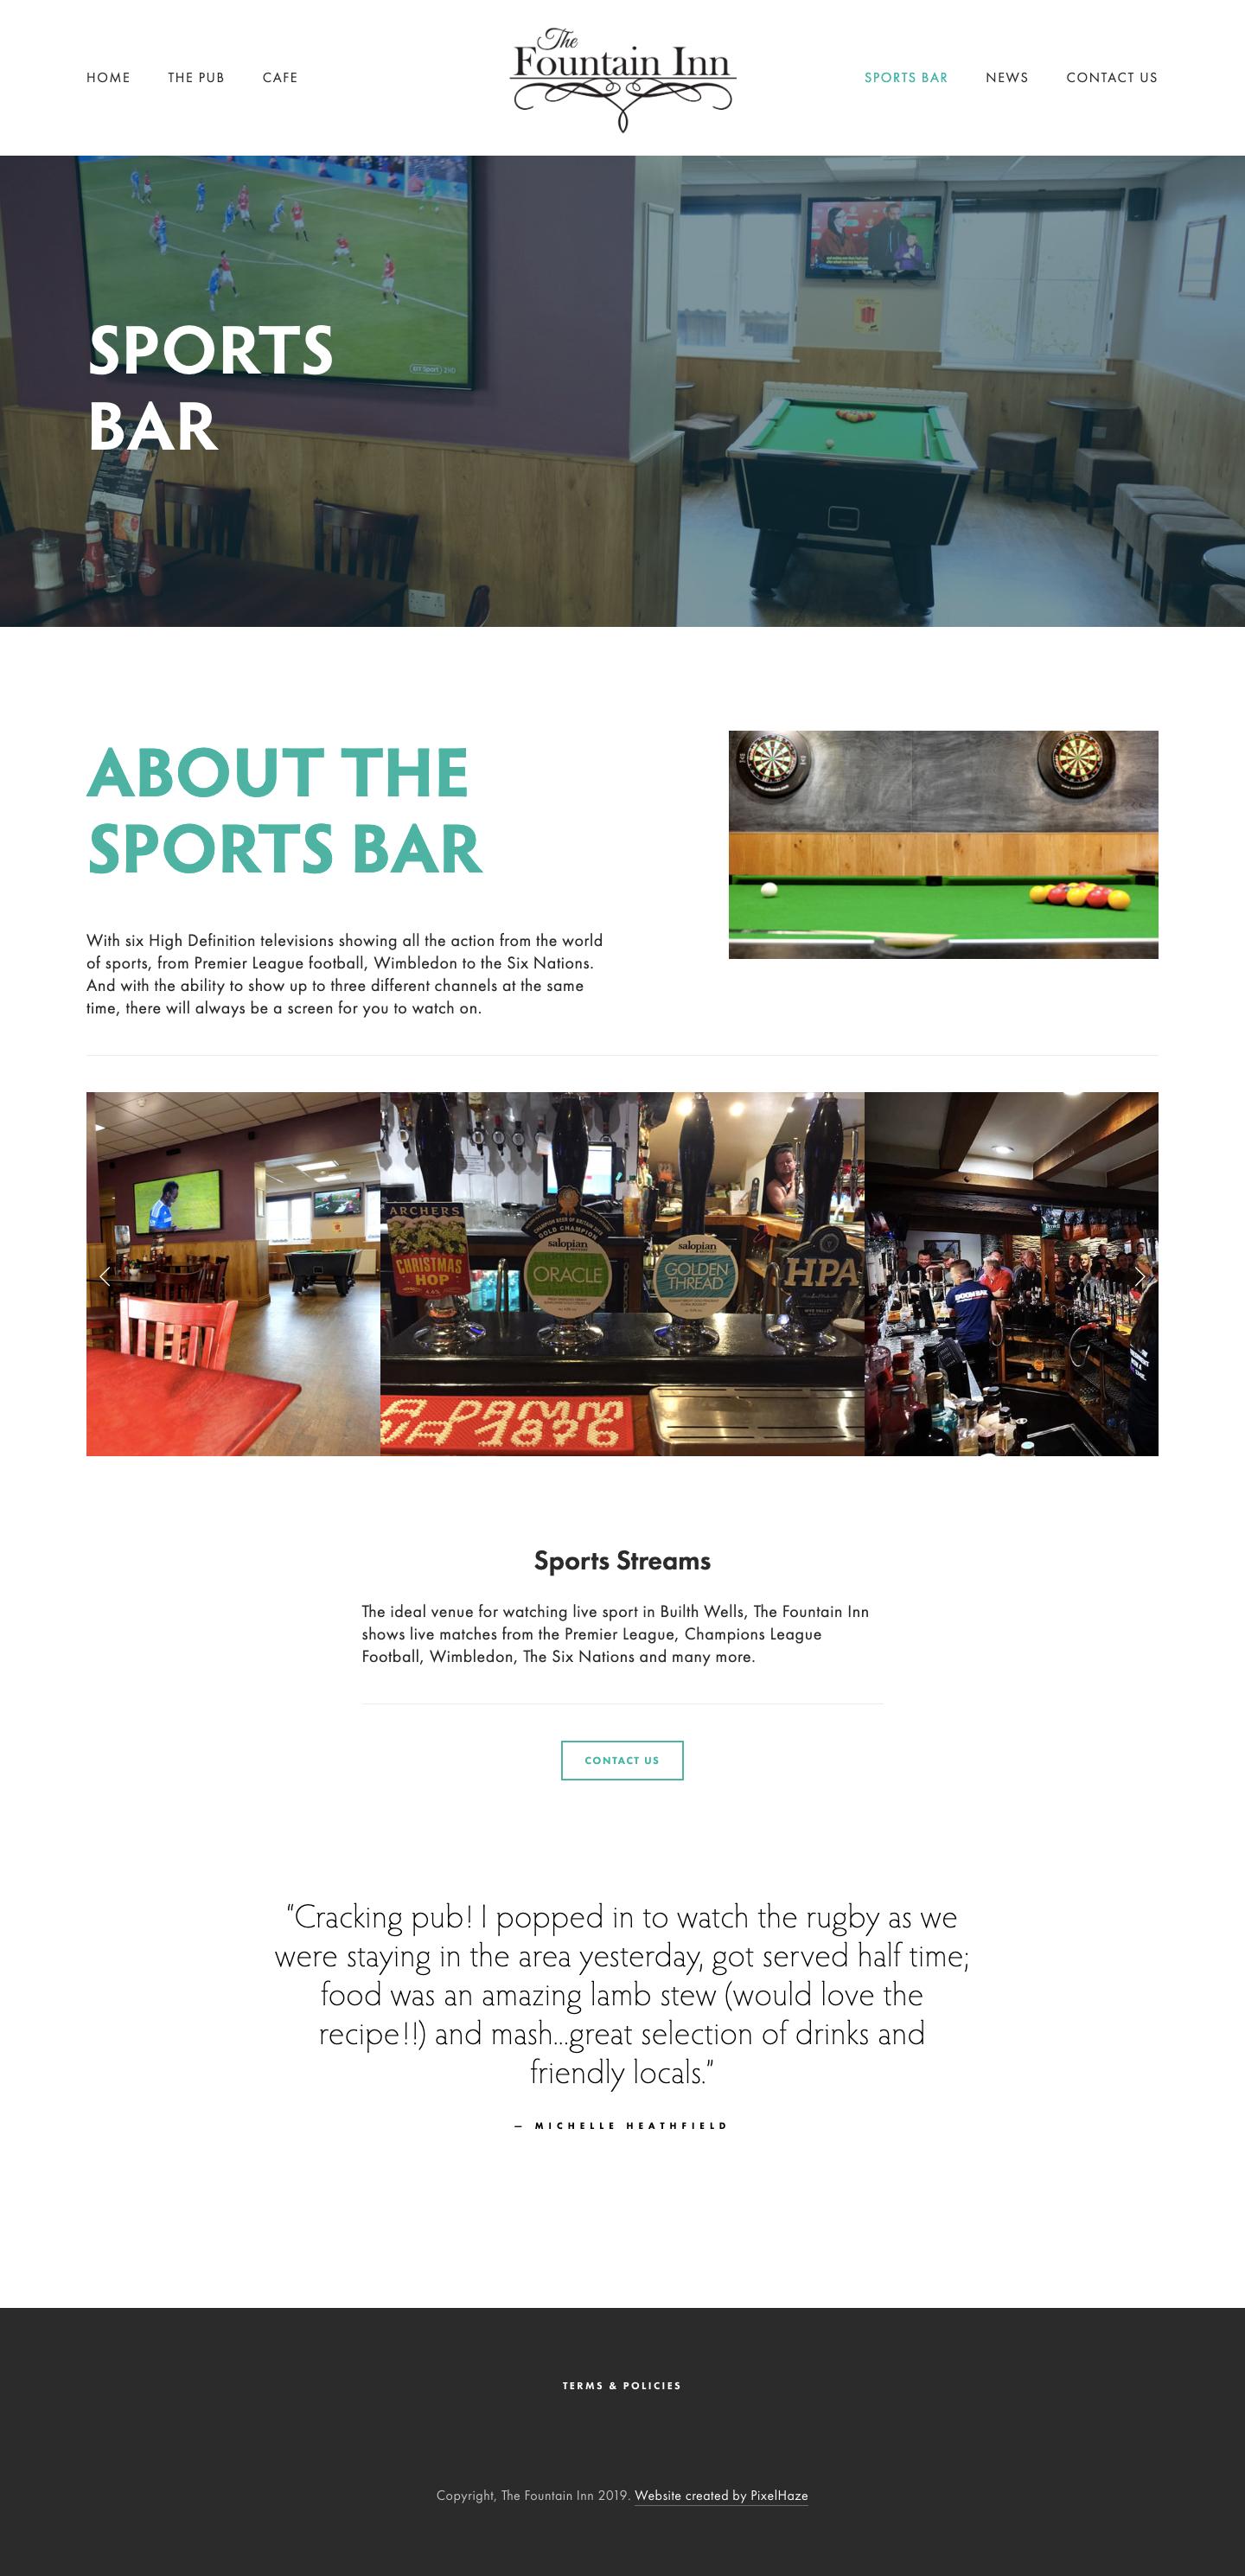 screencapture-fountaininnbuilthwells-co-uk-sports-bar-2019-07-10-20_41_55.jpg